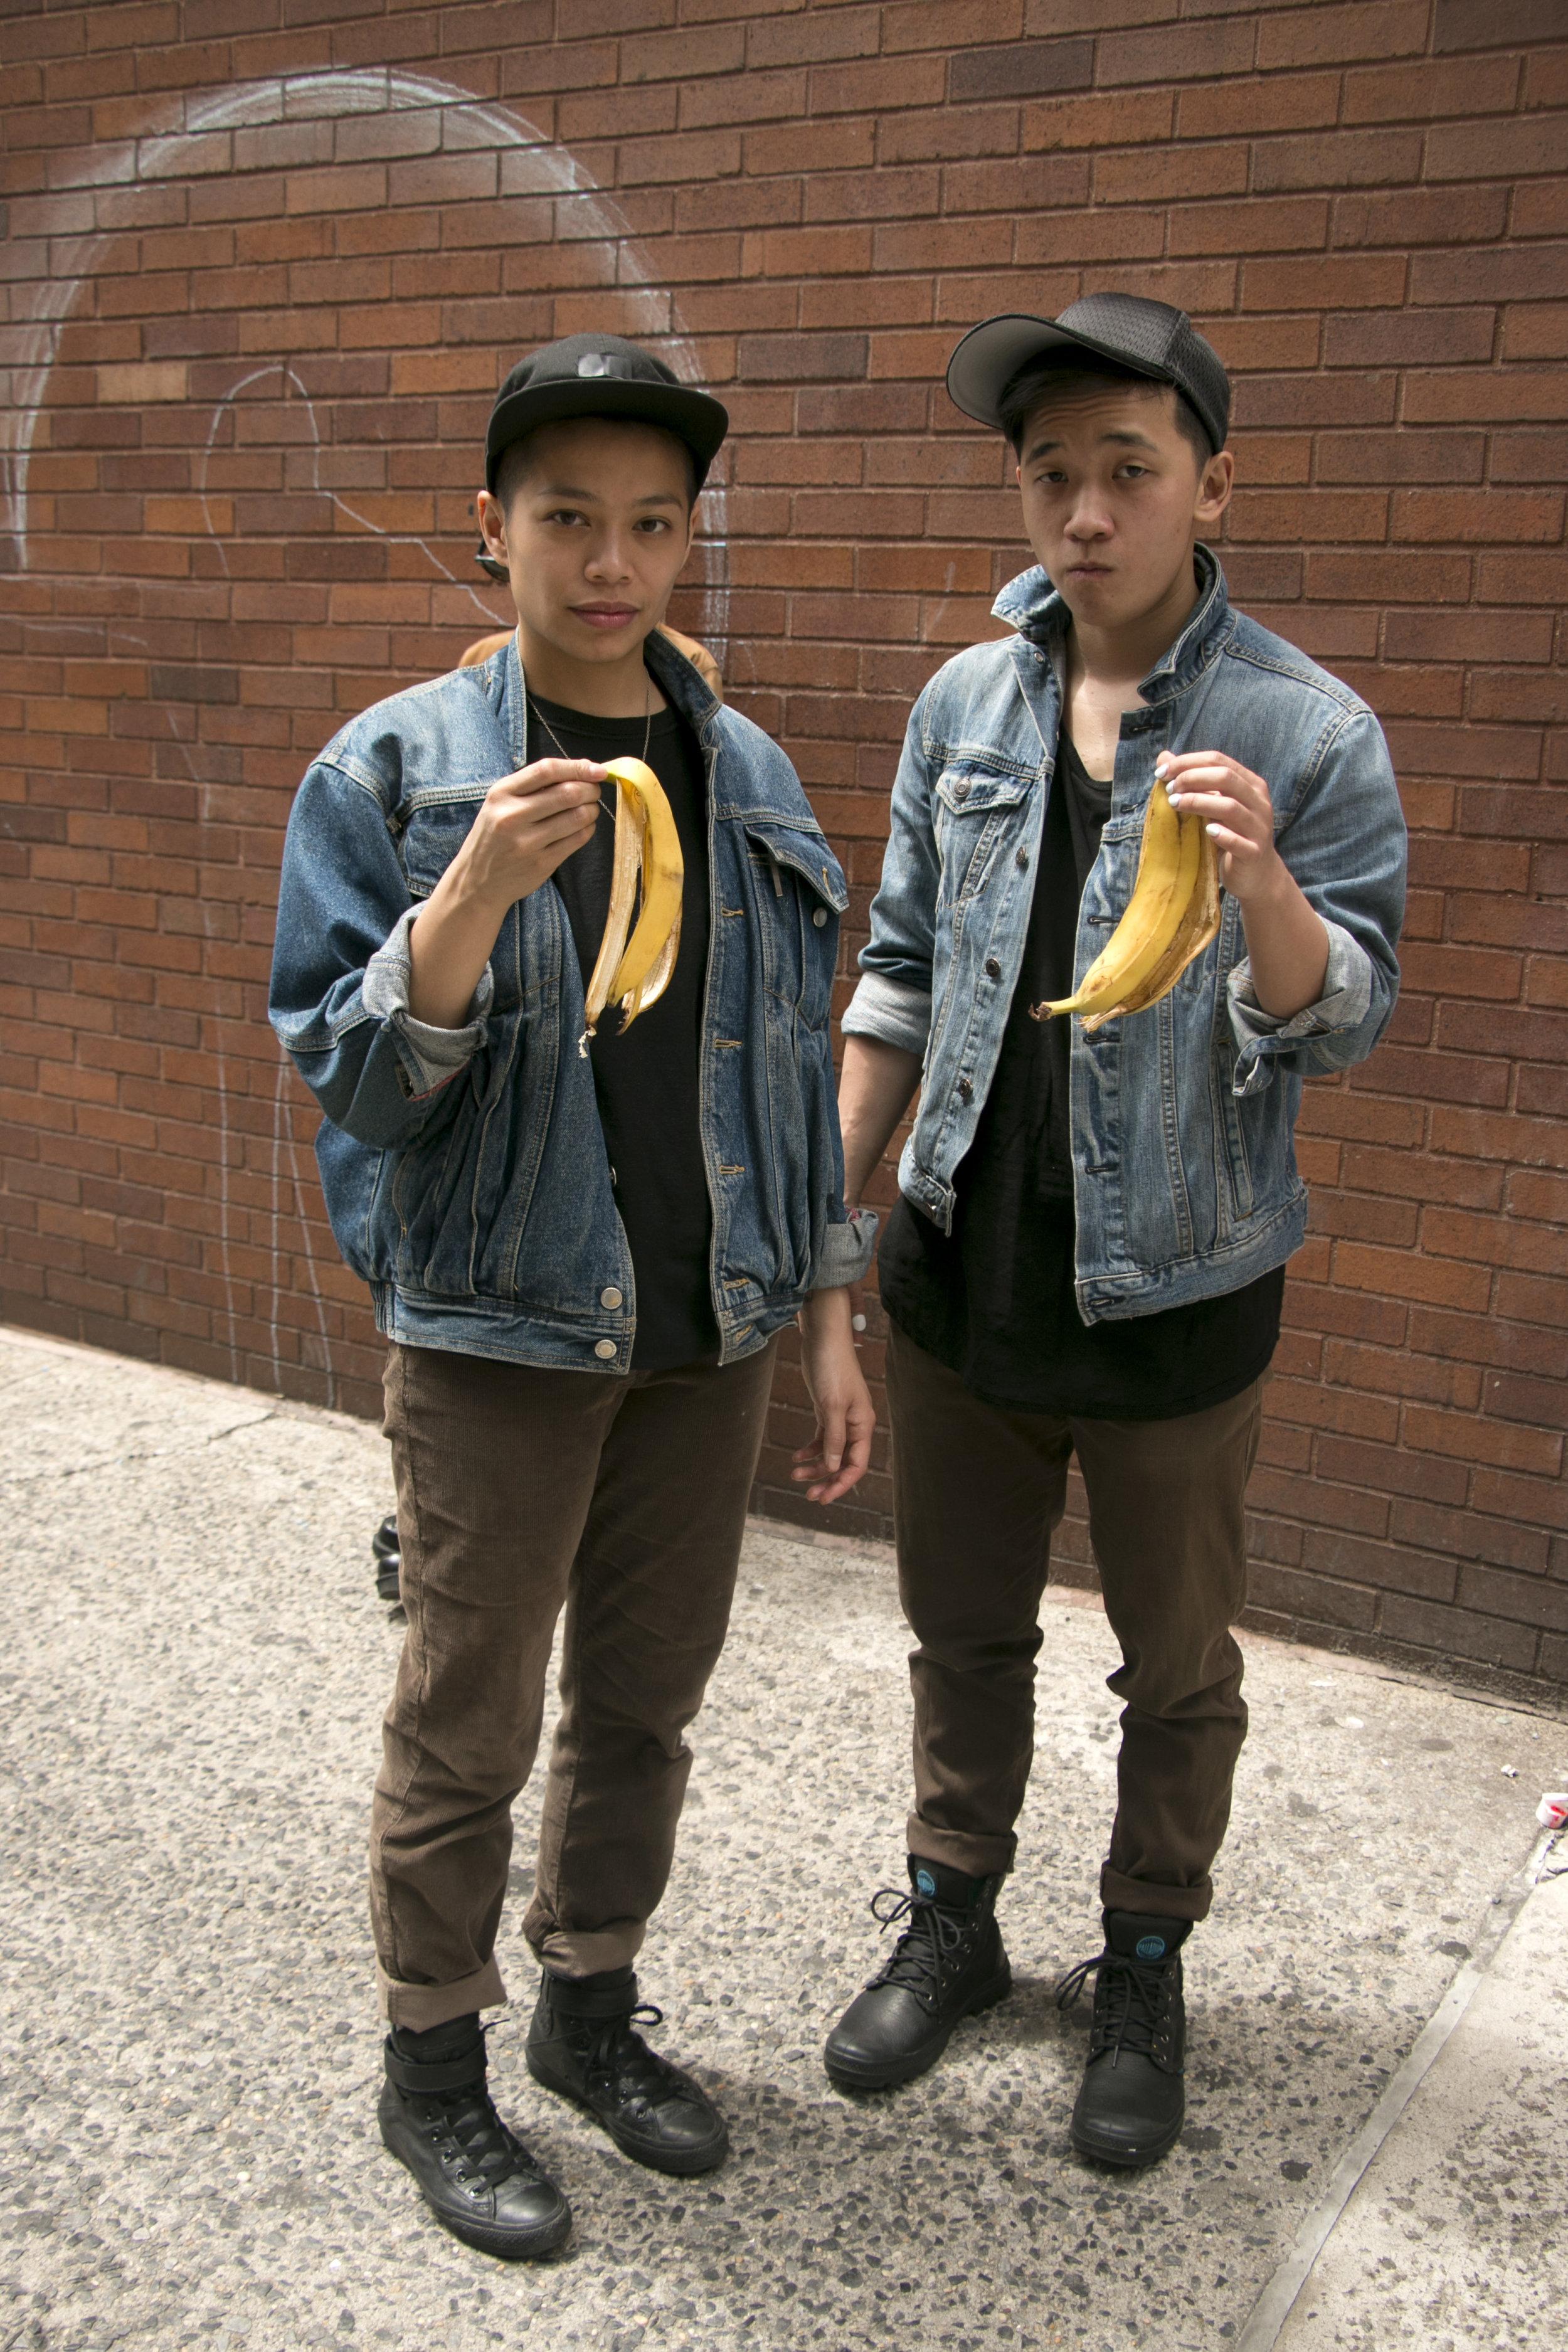 em16_bex-sophia_BananasTwoWays-DoubleTrouble_mrc_4846 (2).jpg